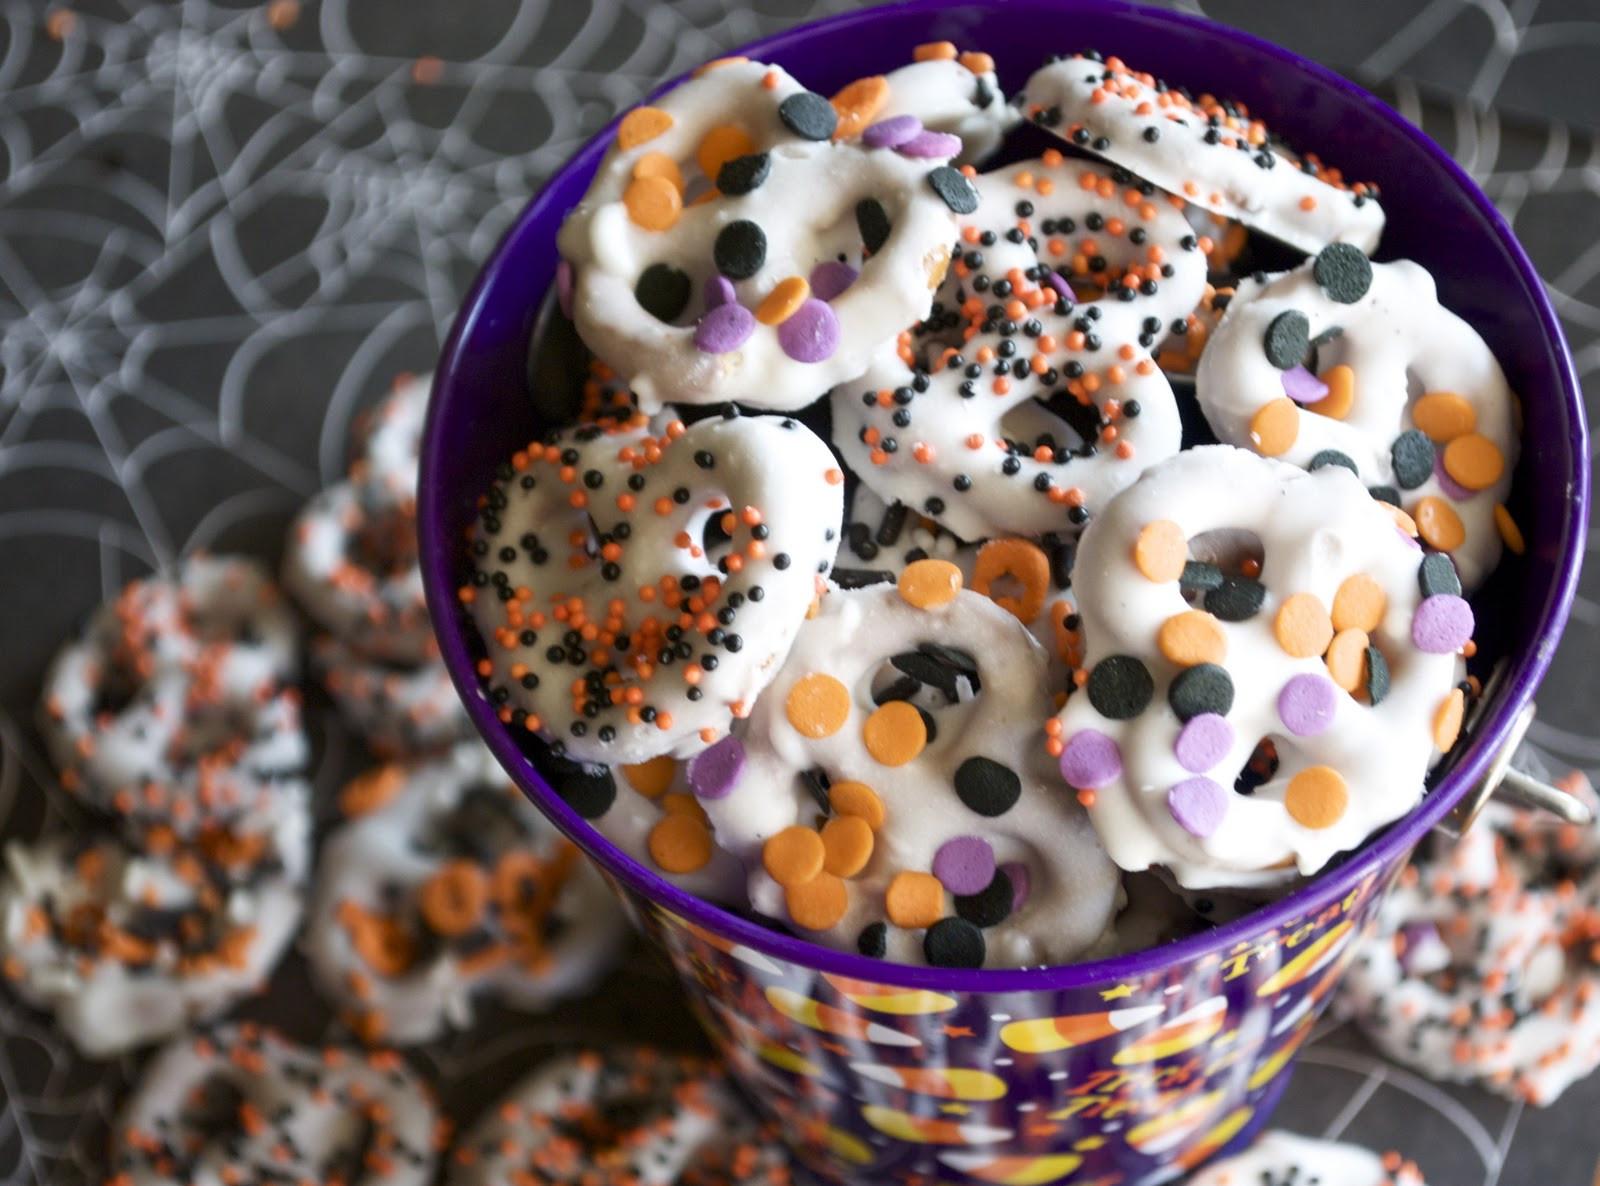 Chocolate Dipped Pretzels For Halloween  Chocolate Covered Pretzels A Pumpkin And A Princess